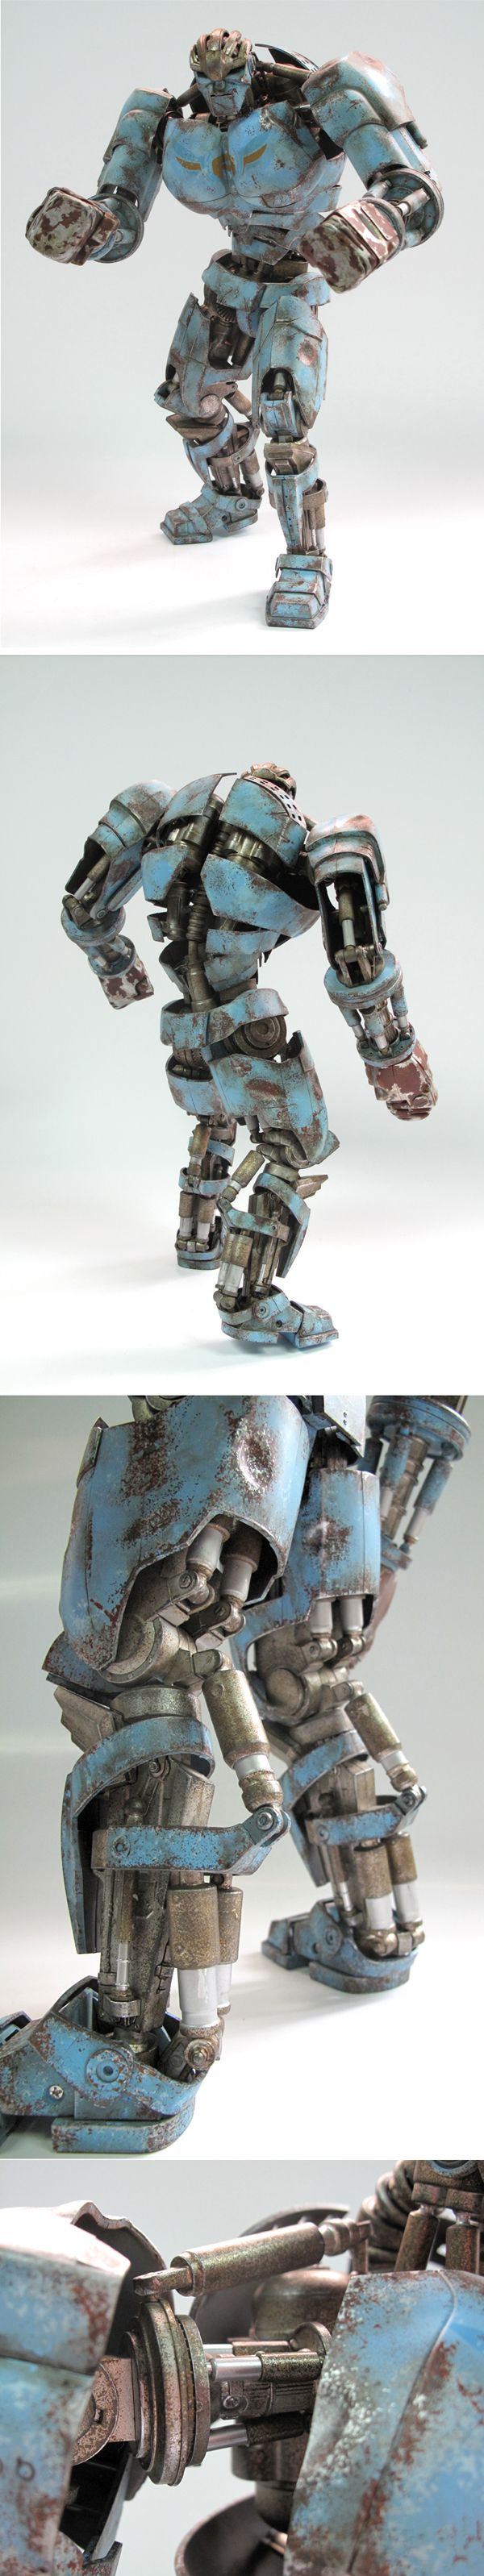 Real Steel, future, robot, science fiction movie, futuristic